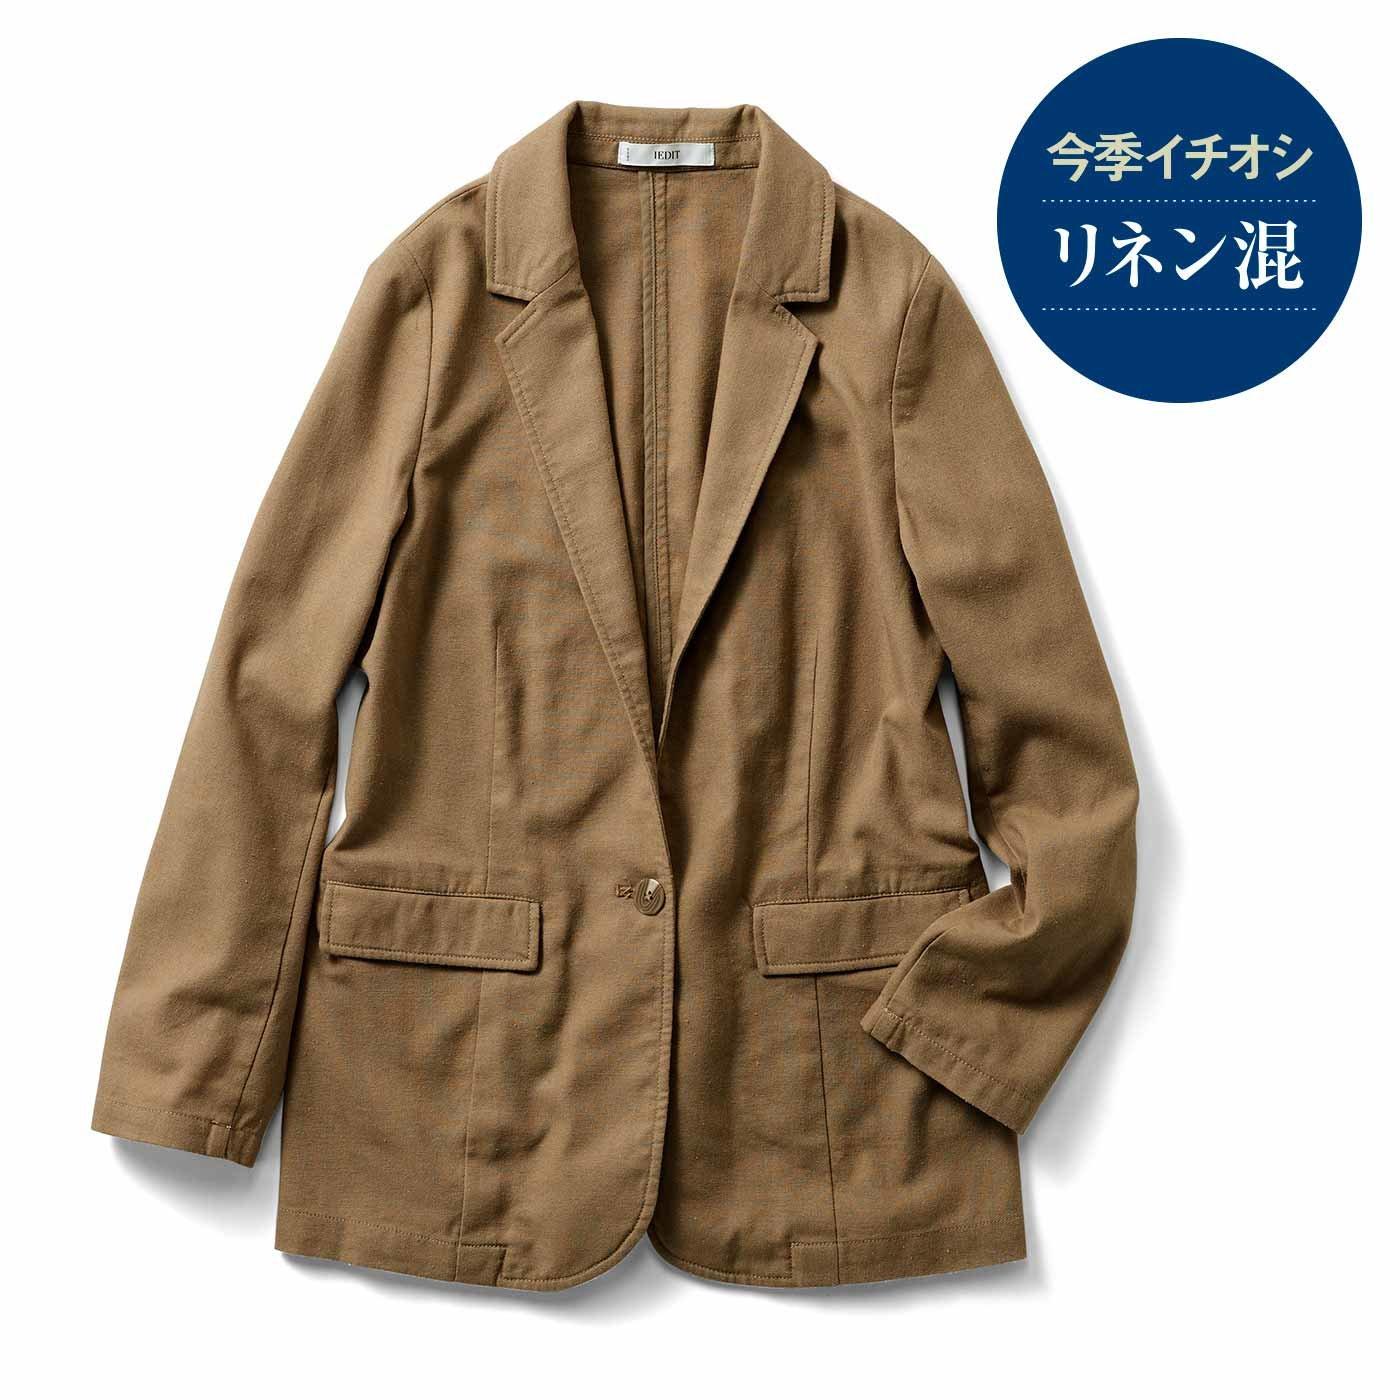 IEDIT[イディット] リネン混素材で上質にこなれる きれい見えジャケット〈キャメル〉